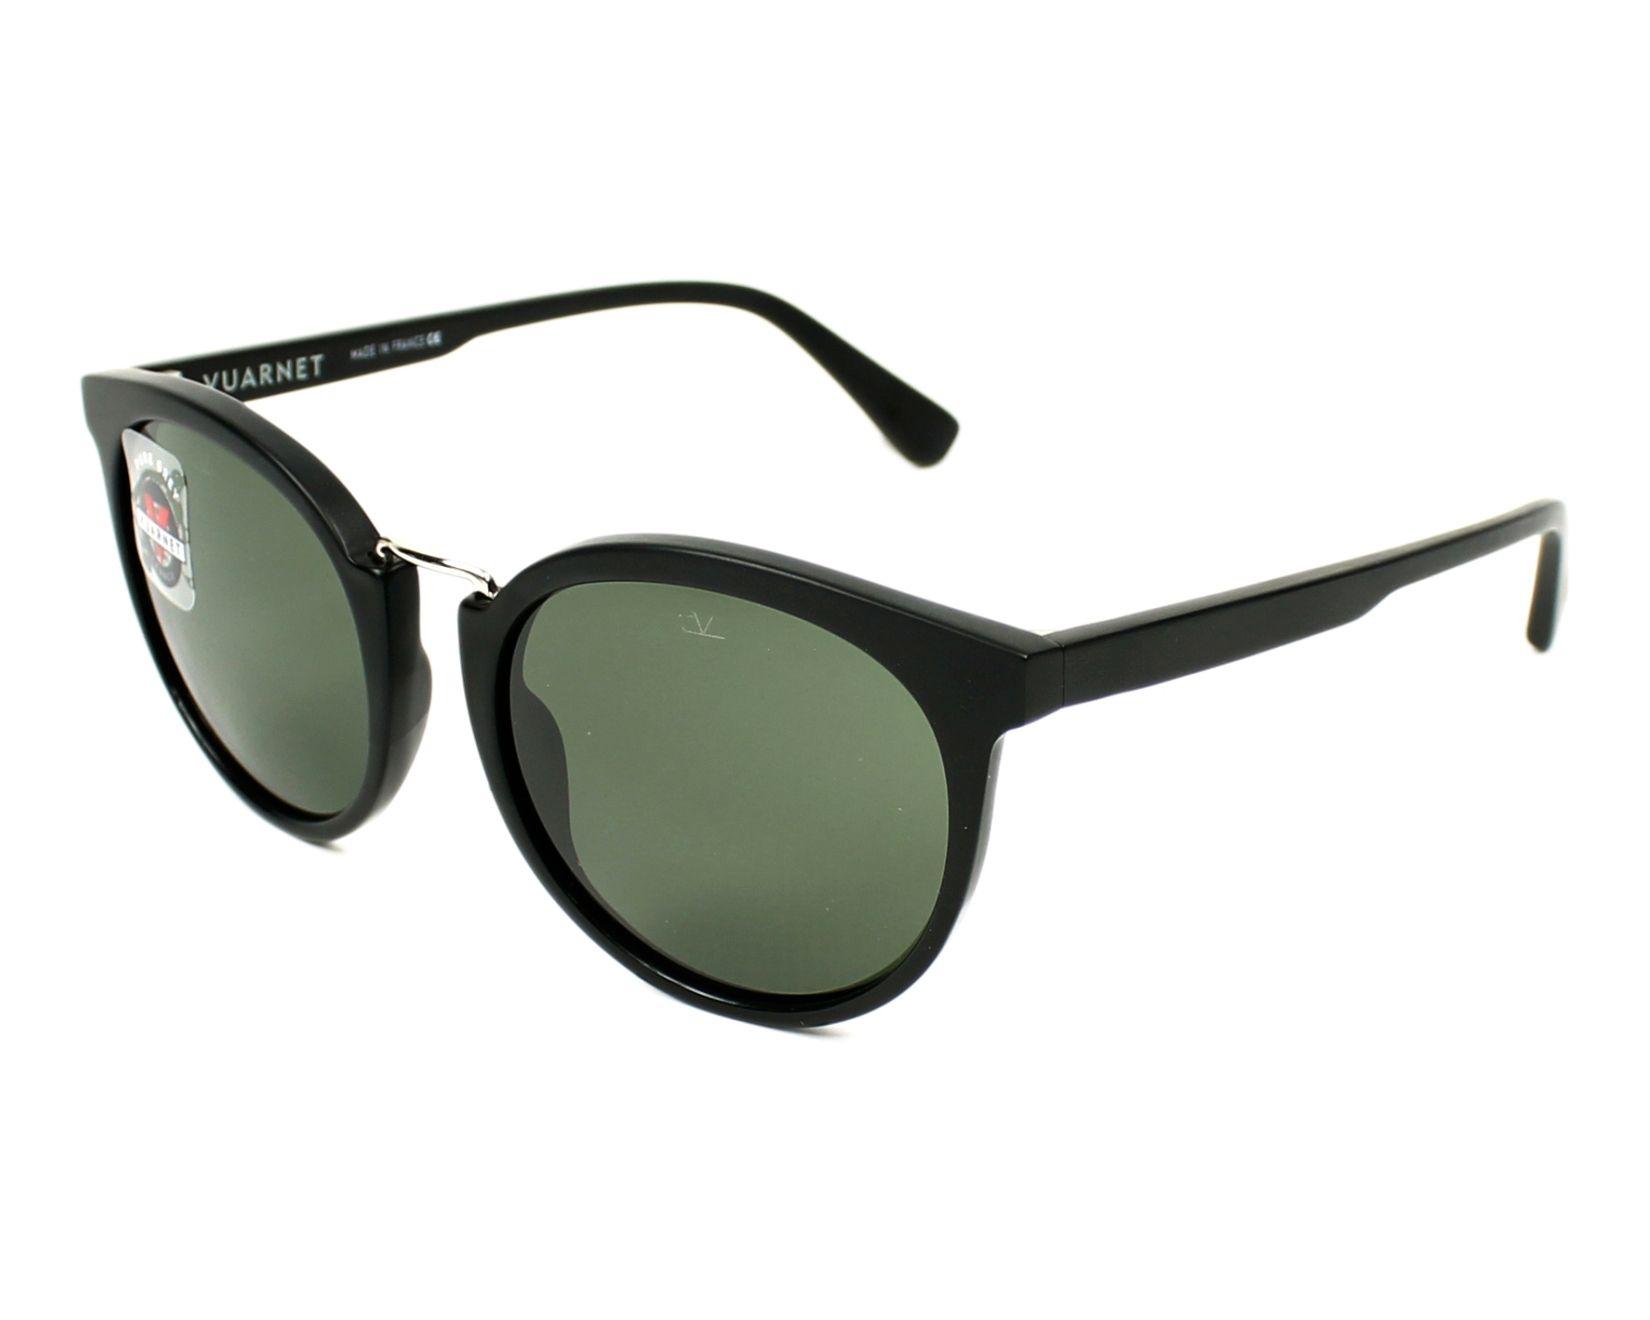 9f4ab8b0592 Sunglasses vuarnet black silver profile view jpg 1650x1320 Vuarnet cat eyes